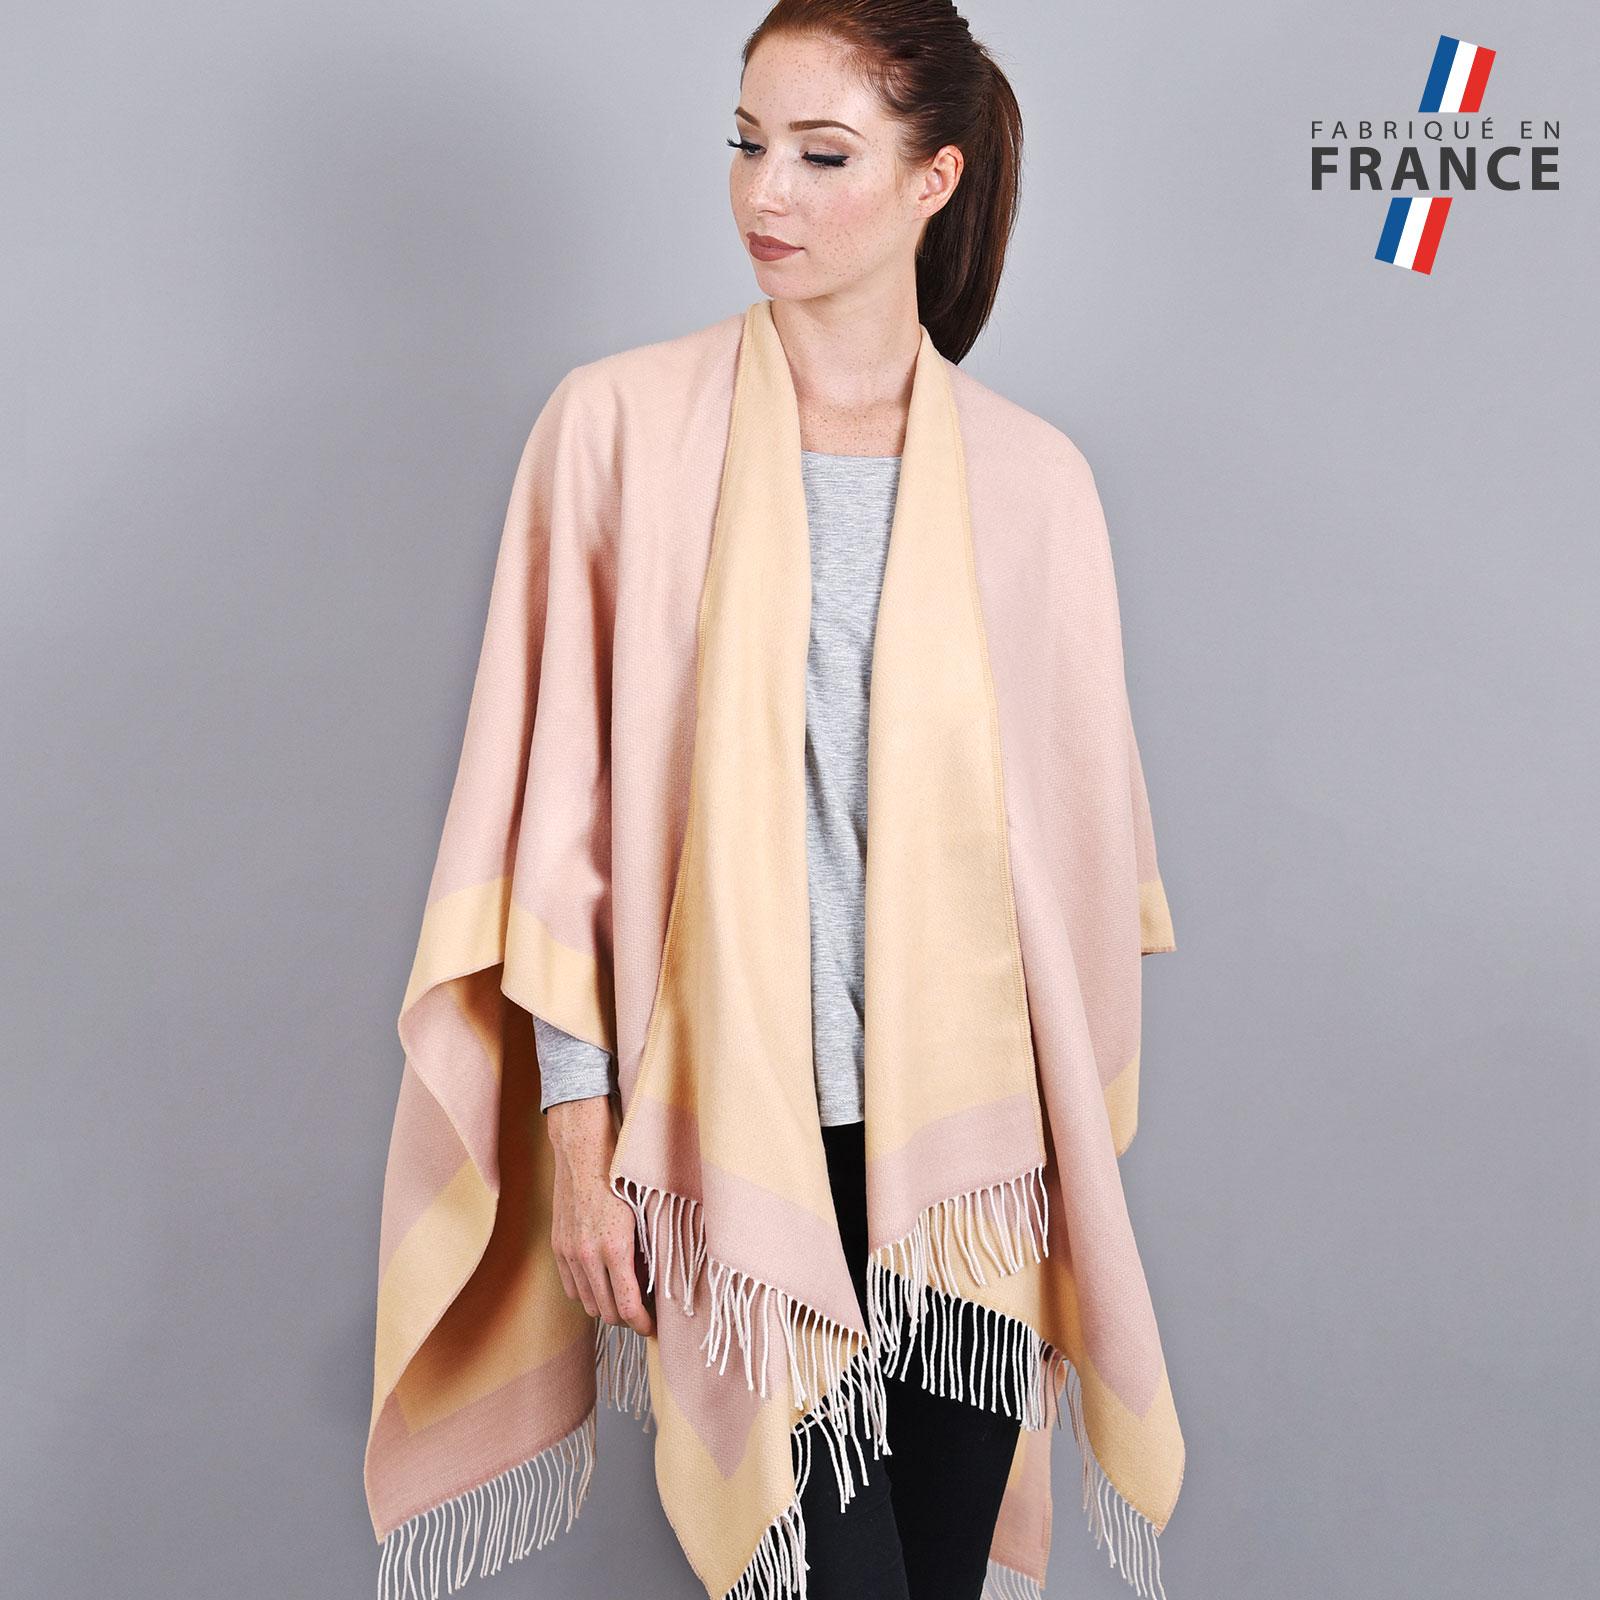 AT-03205-VF16-1-LB_FR-poncho-a-franges-creme-rose-fabrication-france